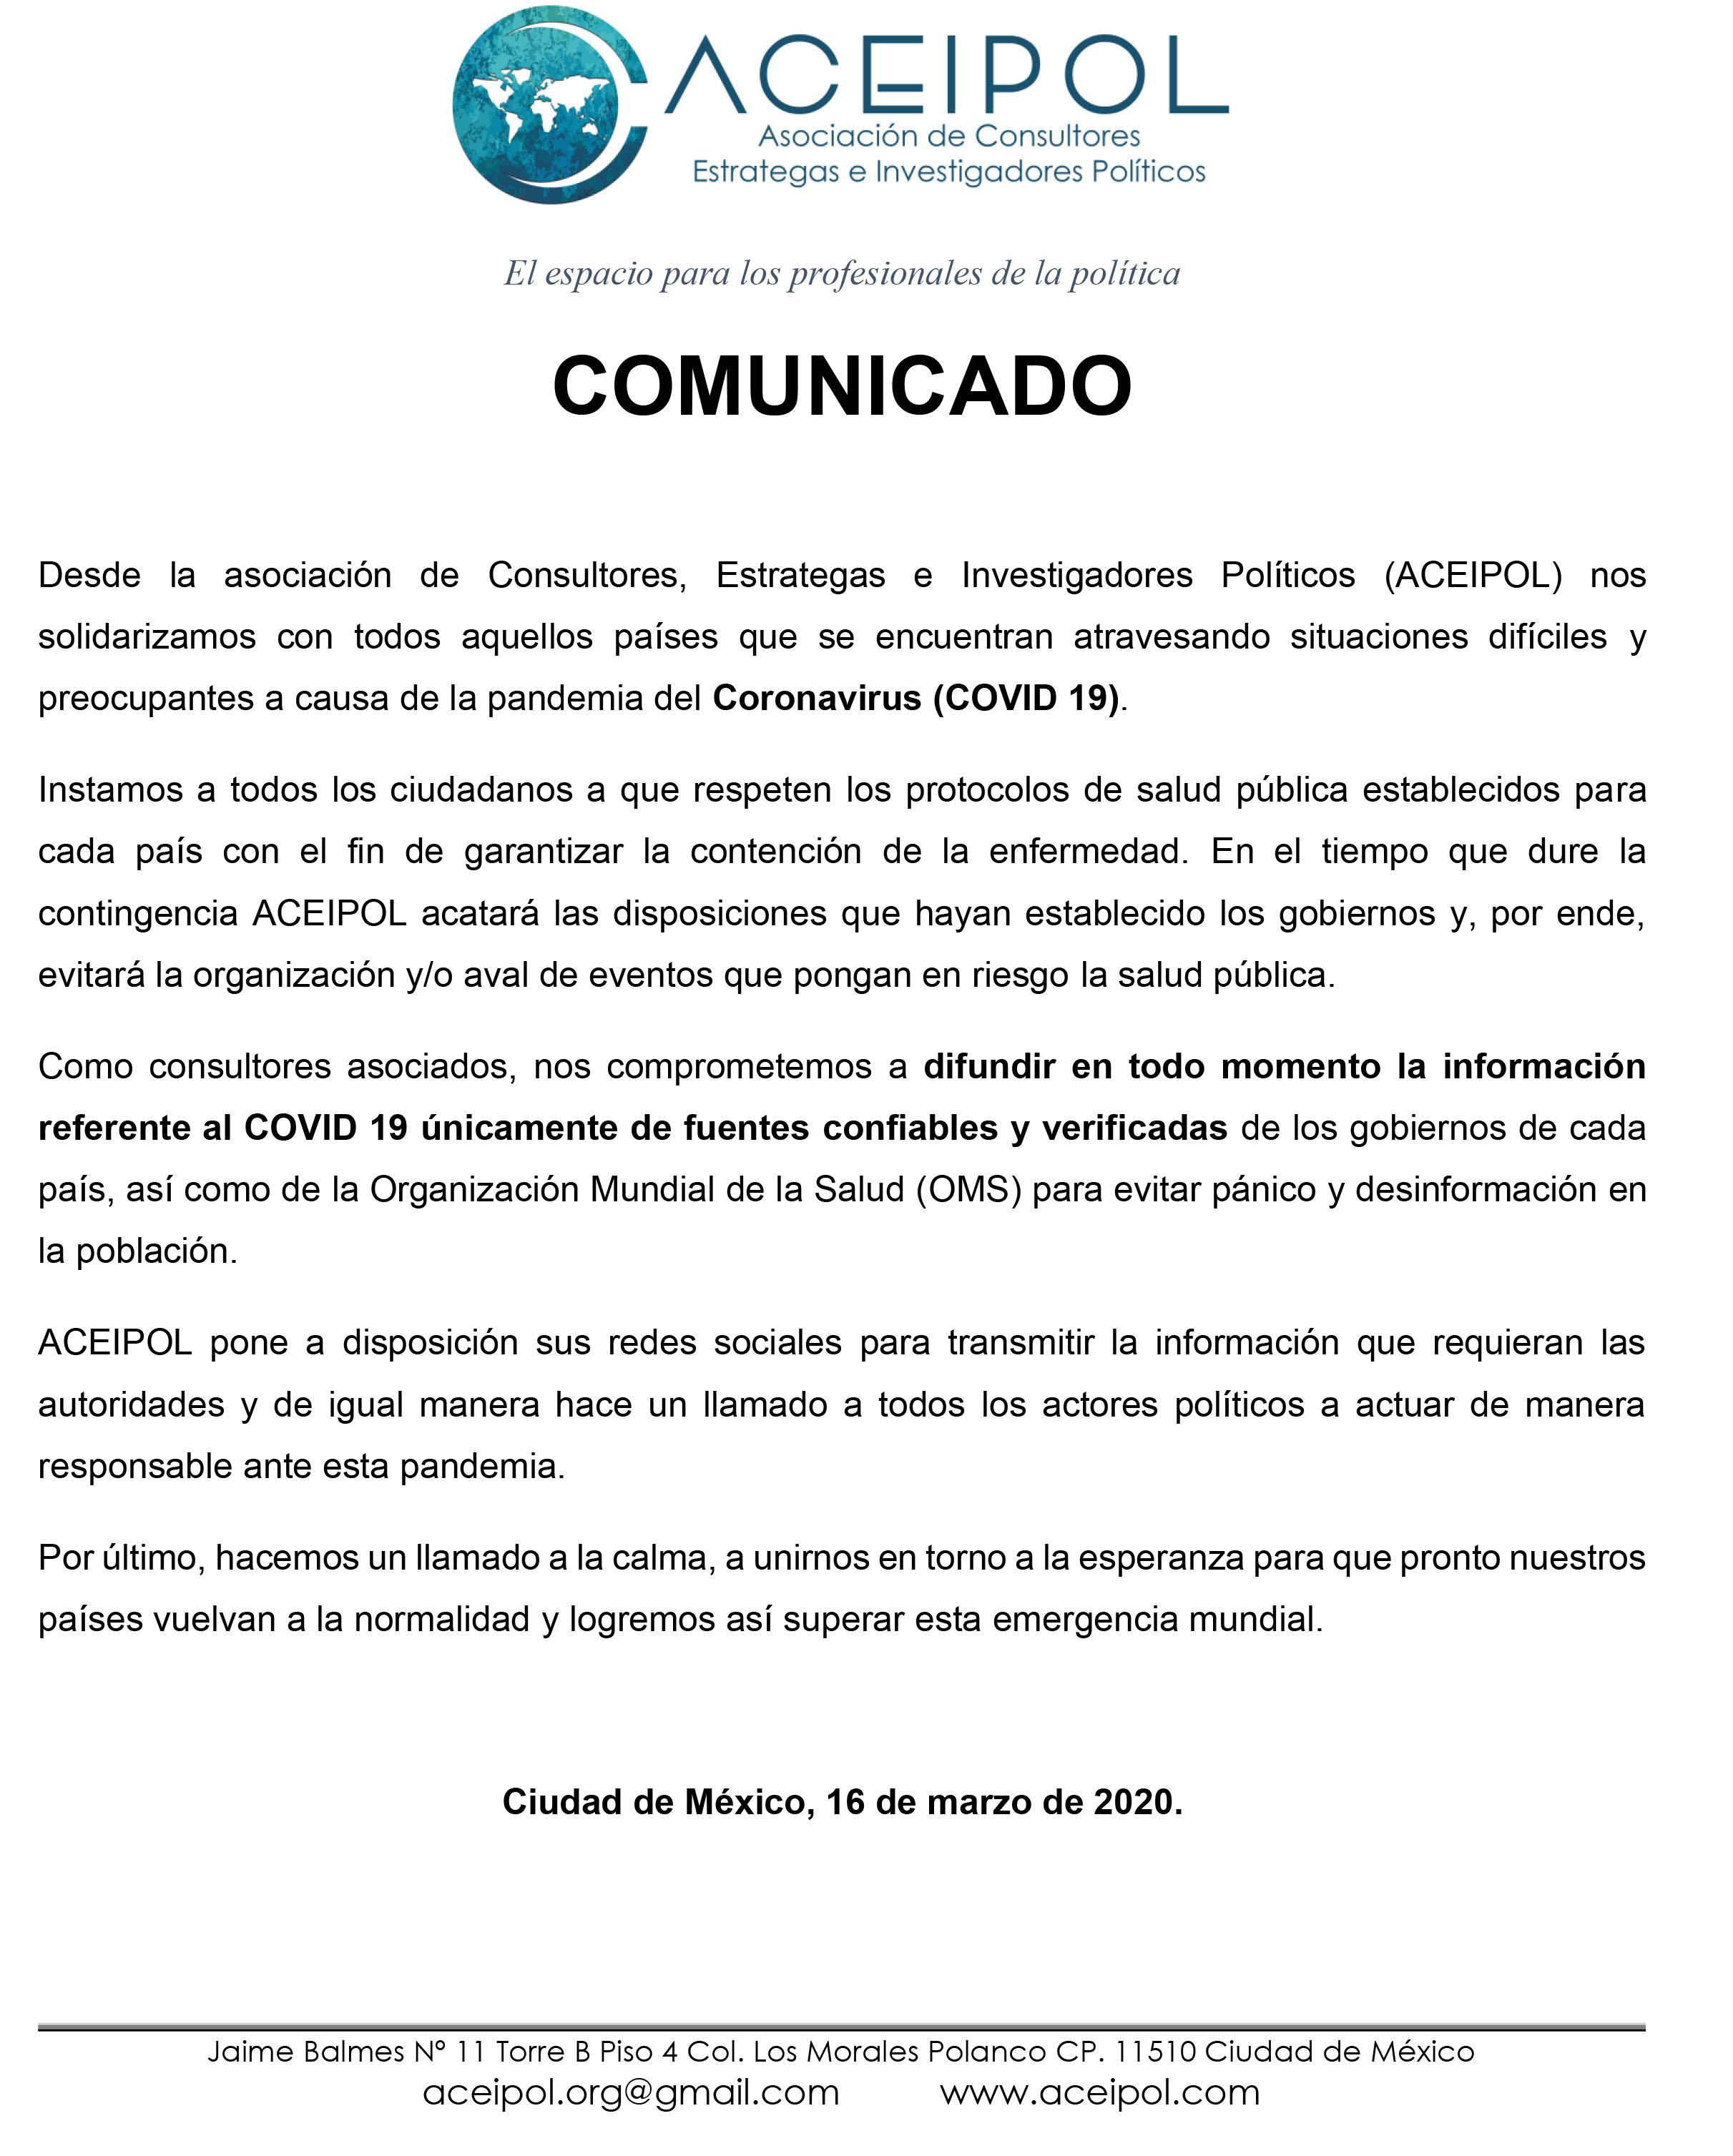 COMUNICADO COVID 19 ACEIPOL-1